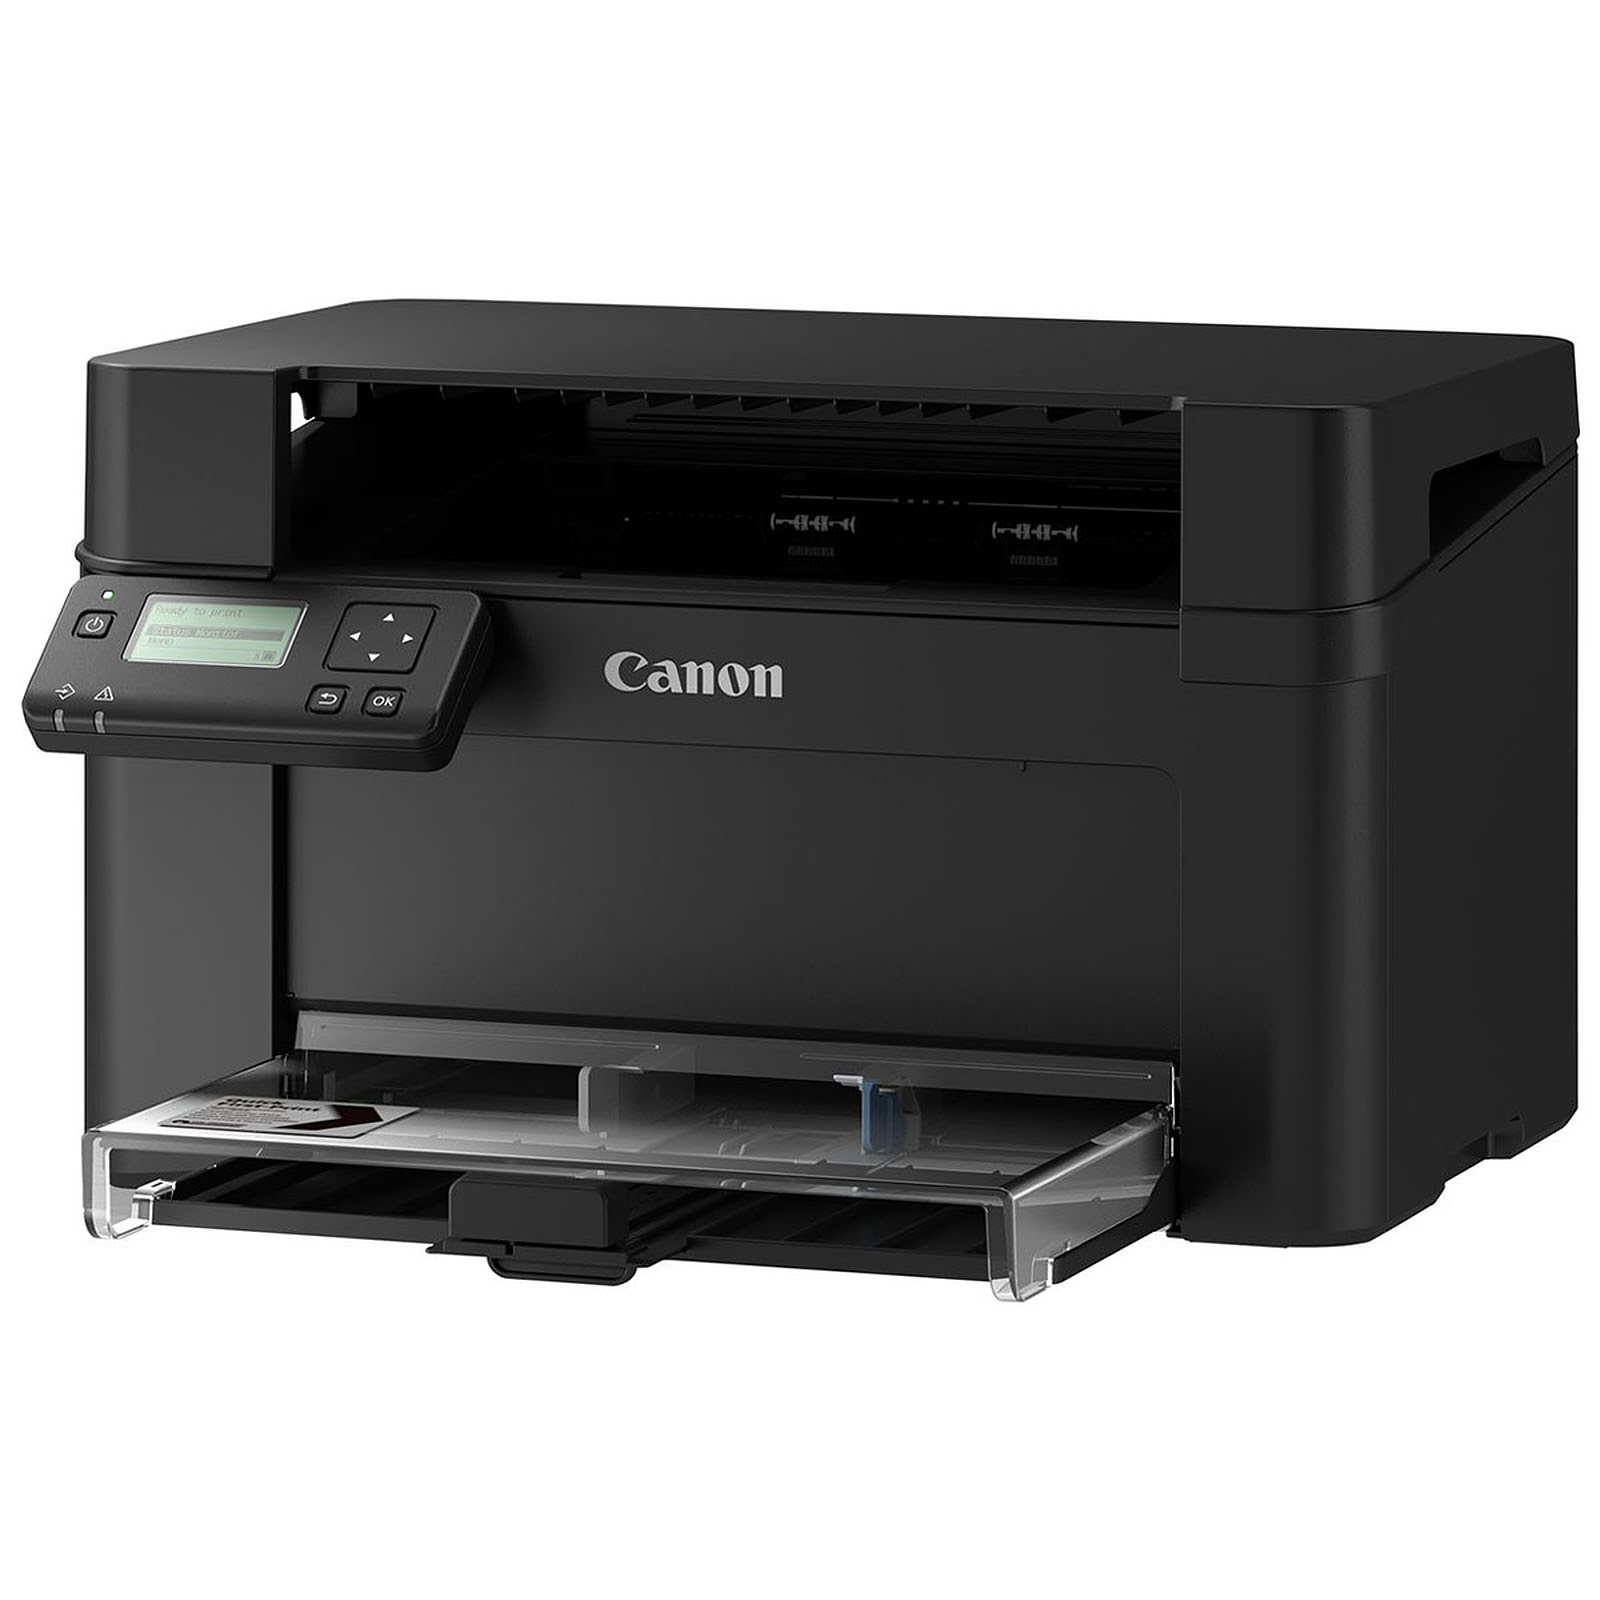 Imprimante Canon I-SENSYS LBP113W - Cybertek.fr - 4